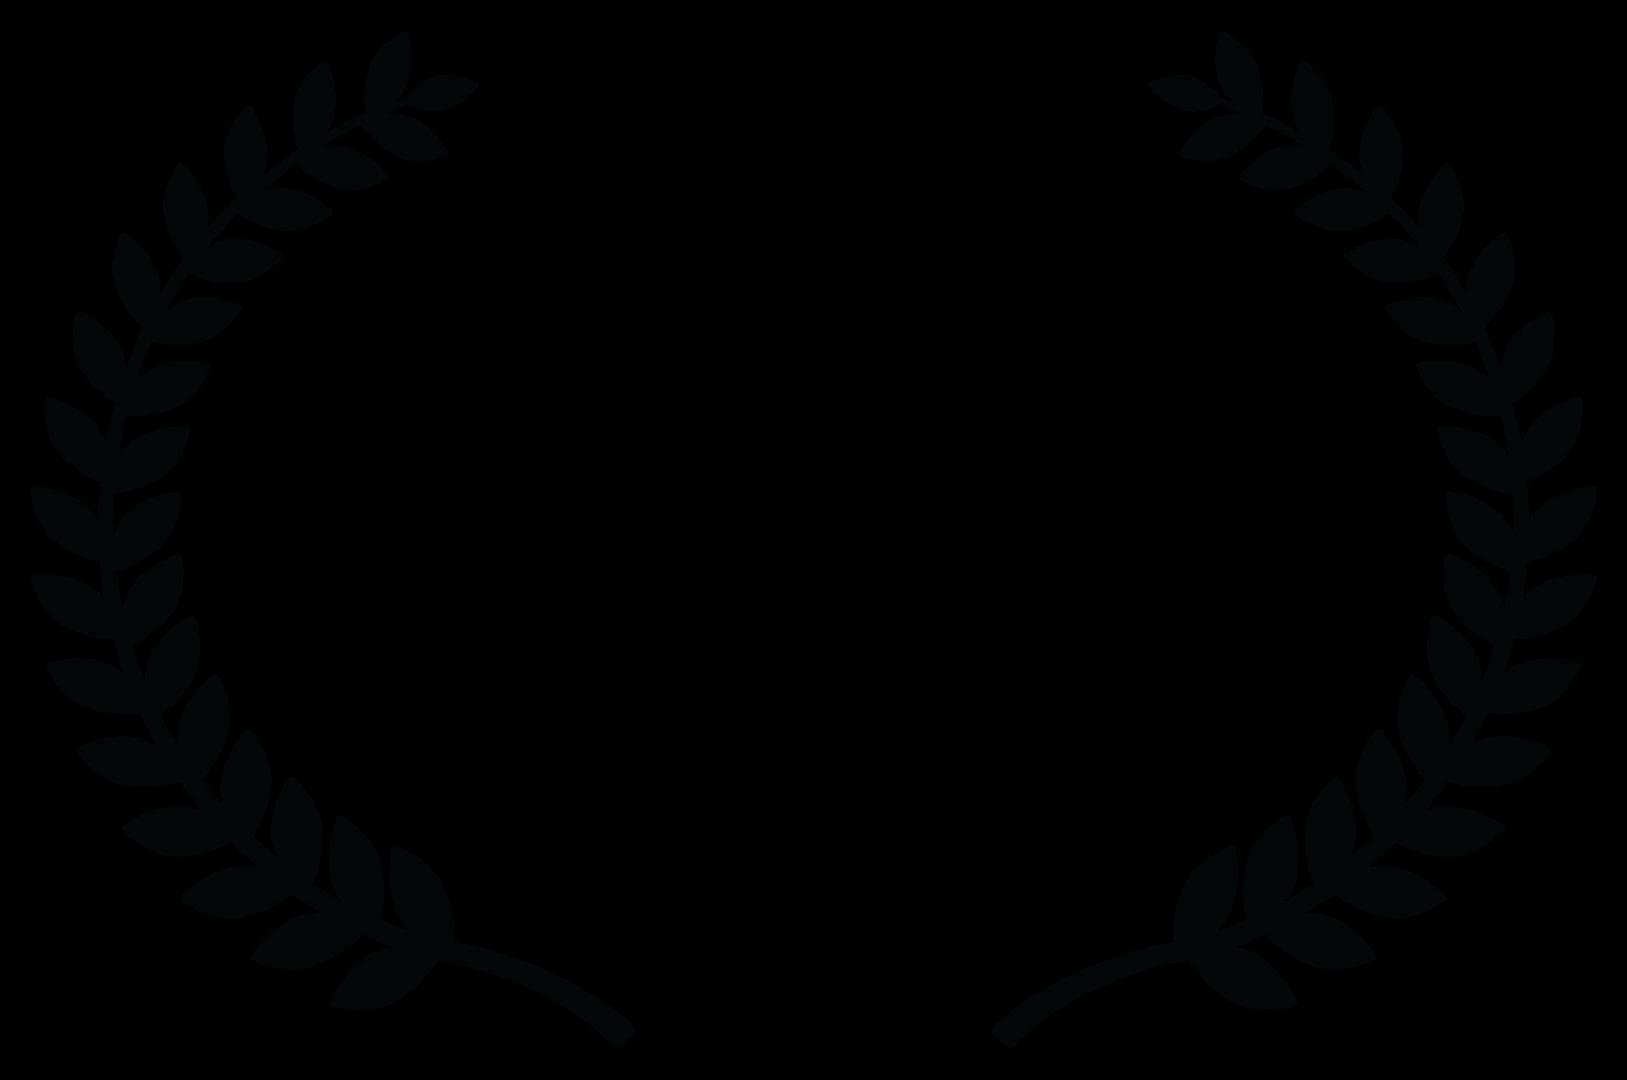 OFFICIAL SELECTION - deadCenter Film Fes